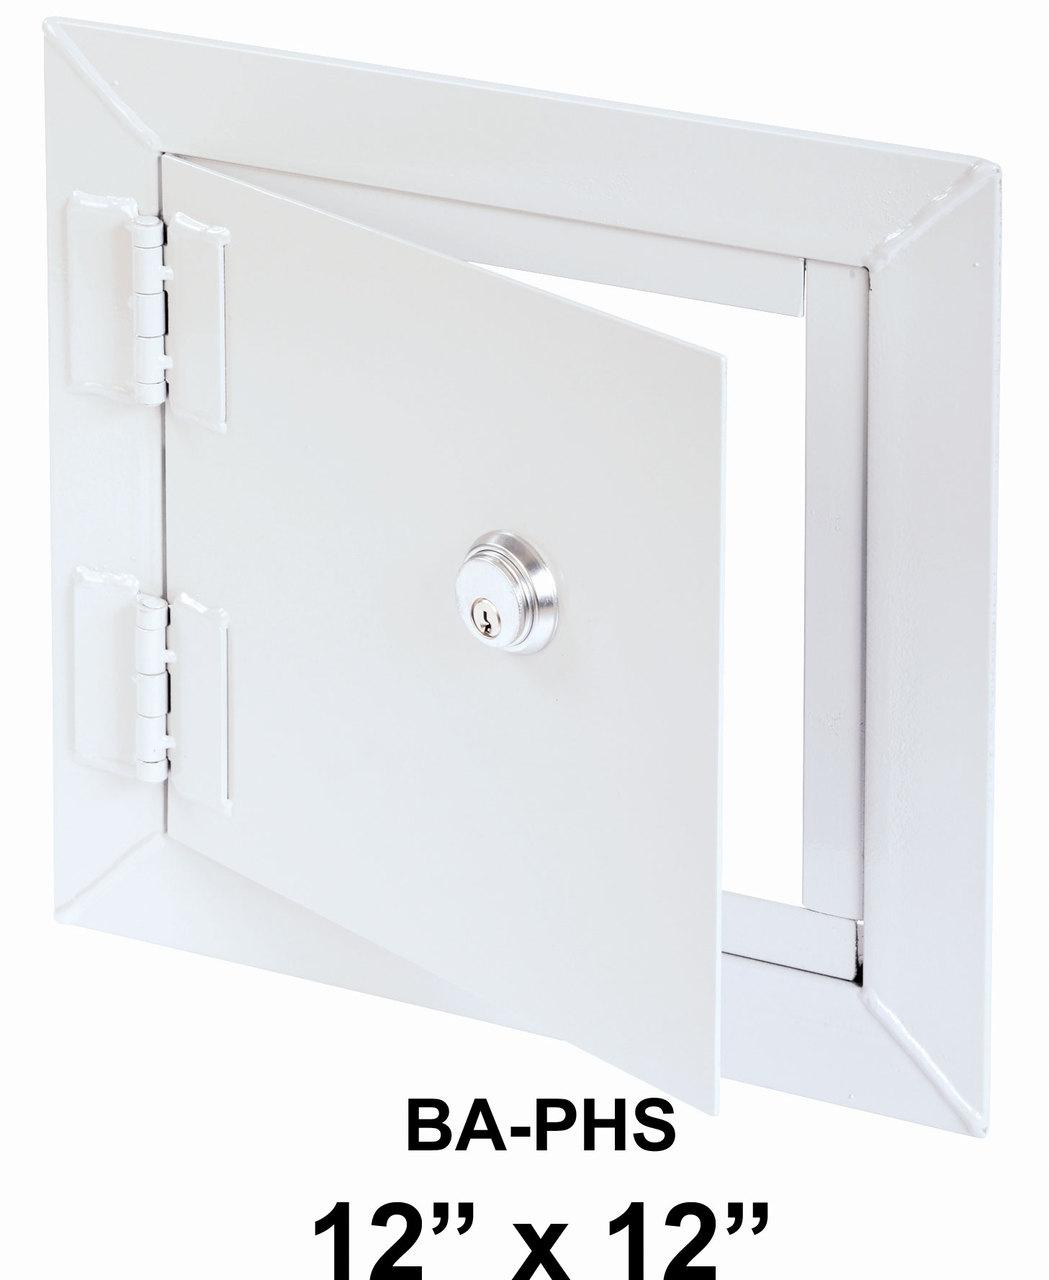 Access Doors BA-PHS 12 x 12 High Security Access - BEST